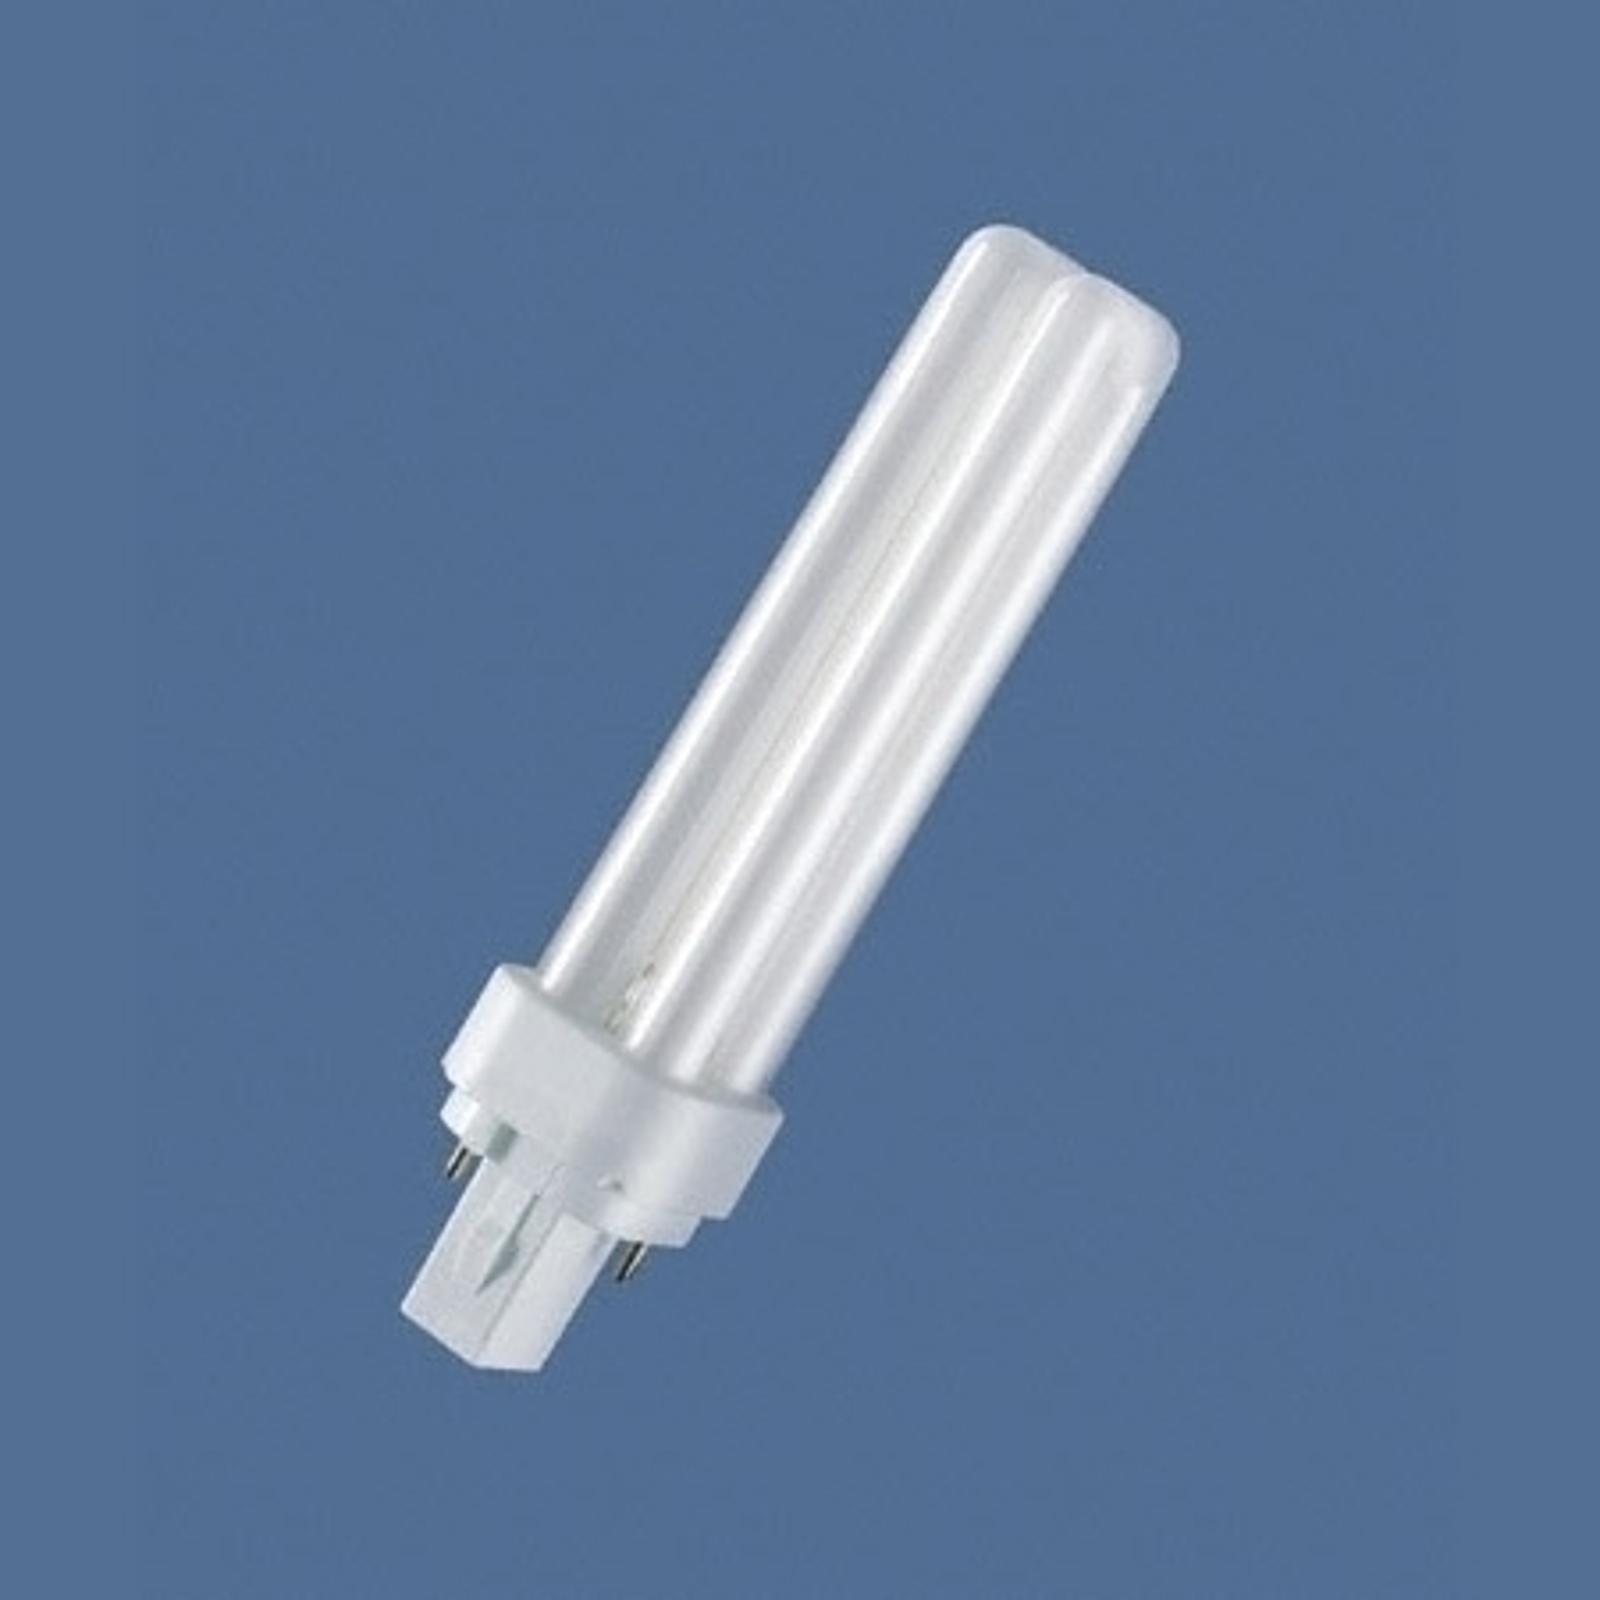 G24d 18W 830 Kompaktleuchtstofflampe Dulux D